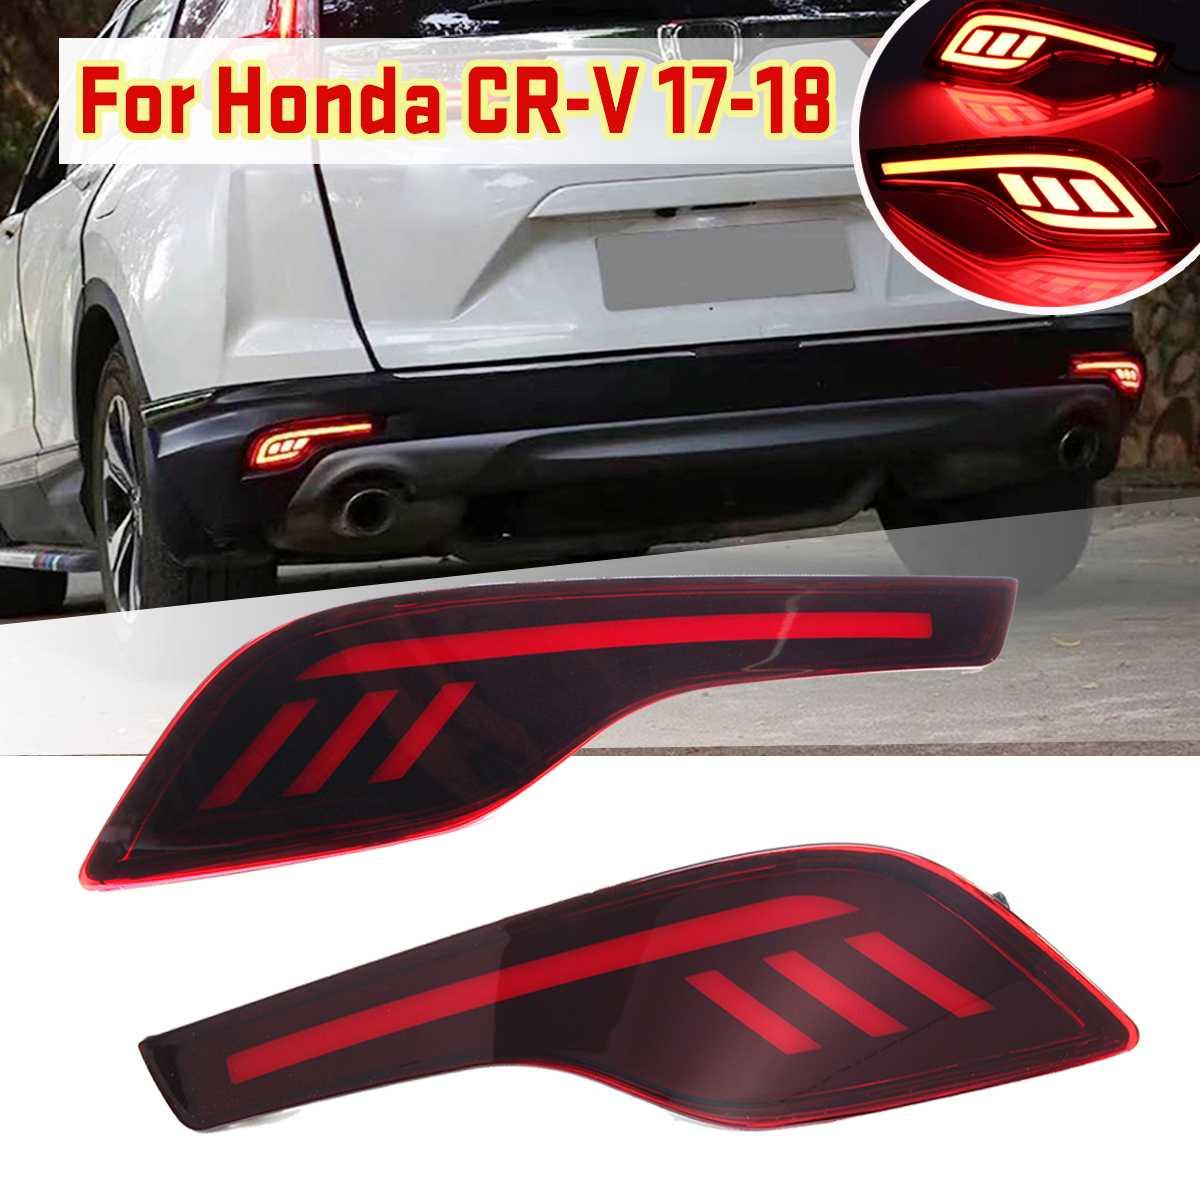 2pcs Car 12V Red LED Rear Bumper Reflector Fog Light Lamp Tail Brake Warning Light For Honda CRV 2017 2018